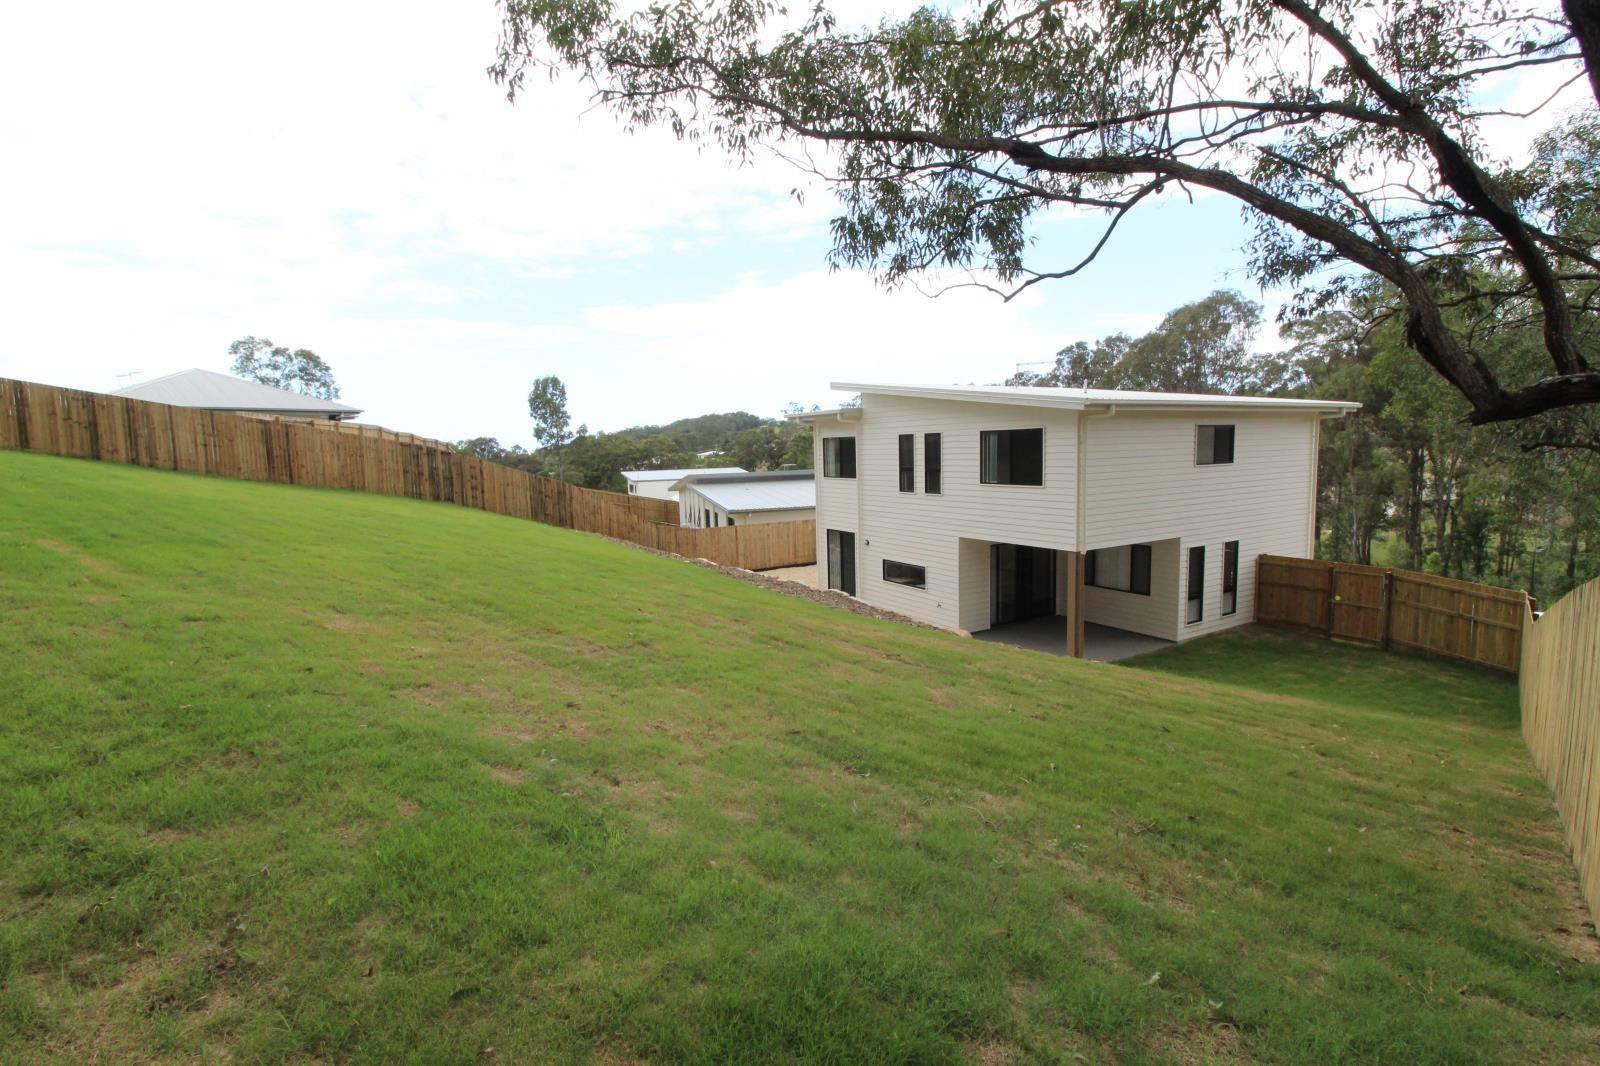 43 Gordon Drive, Upper Coomera QLD 4209, Image 0